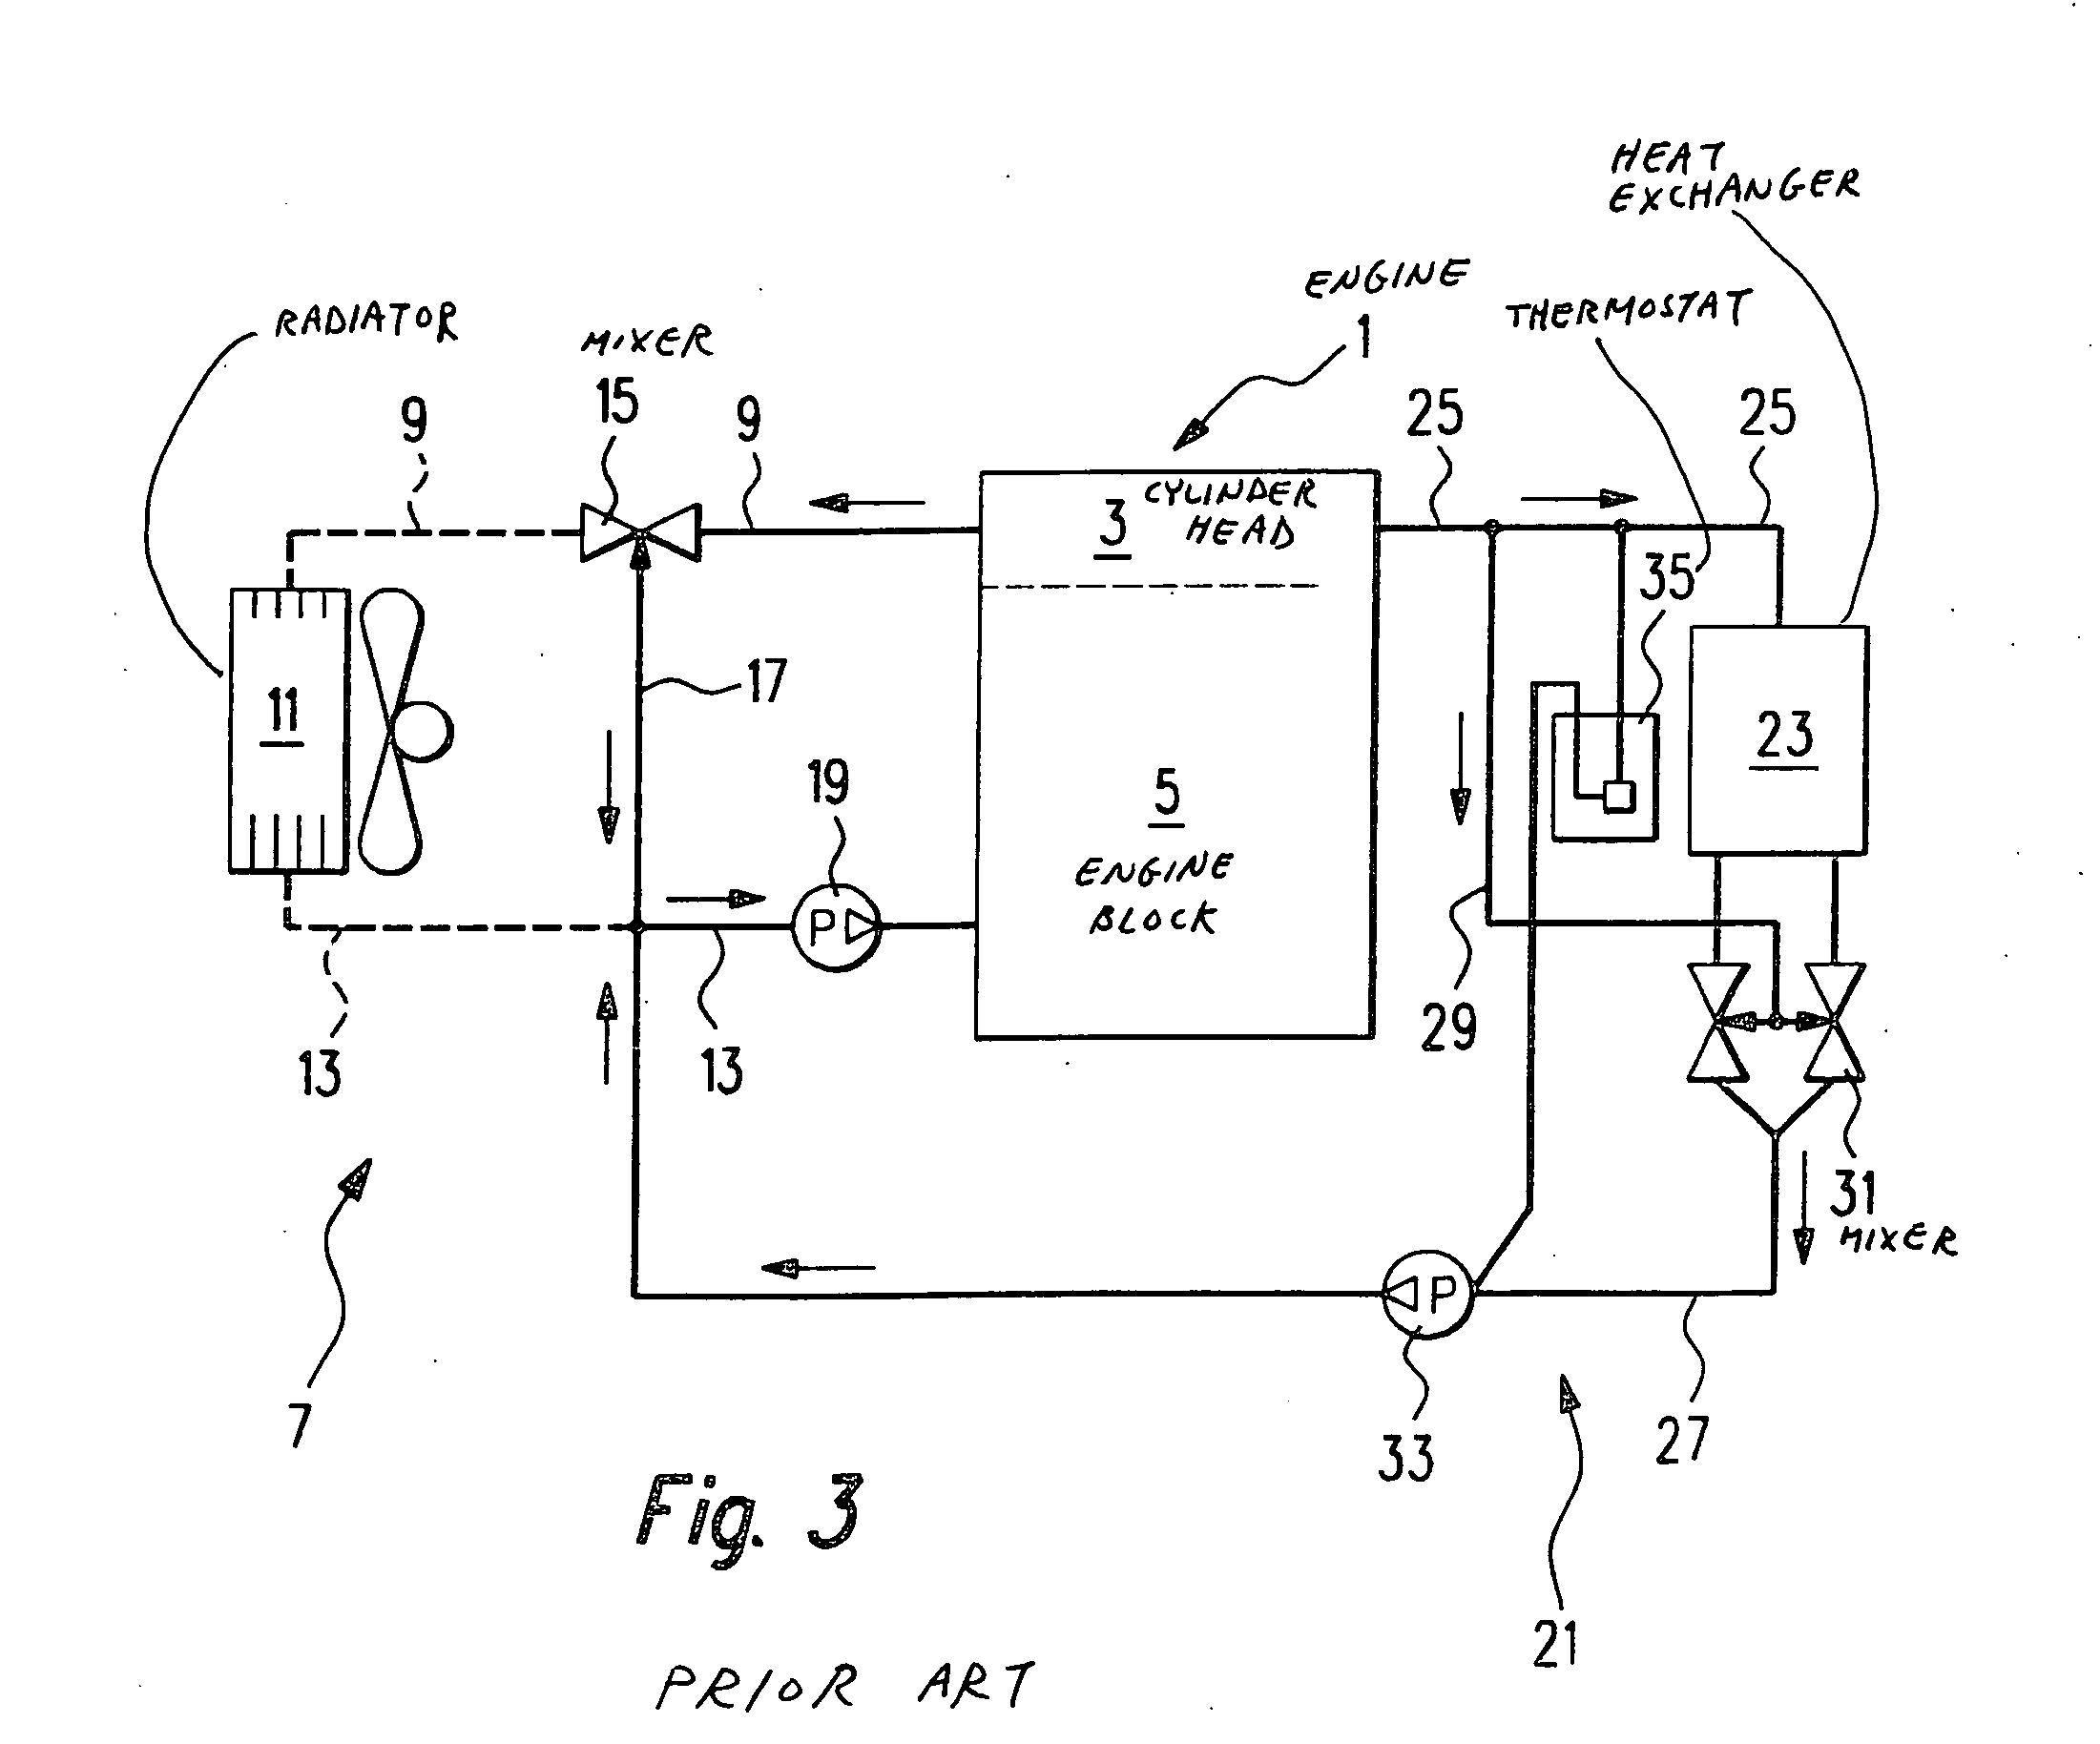 Porsche 944 Wiring Diagrams Monte Carlo Wiring Diagram Tv Power Supply